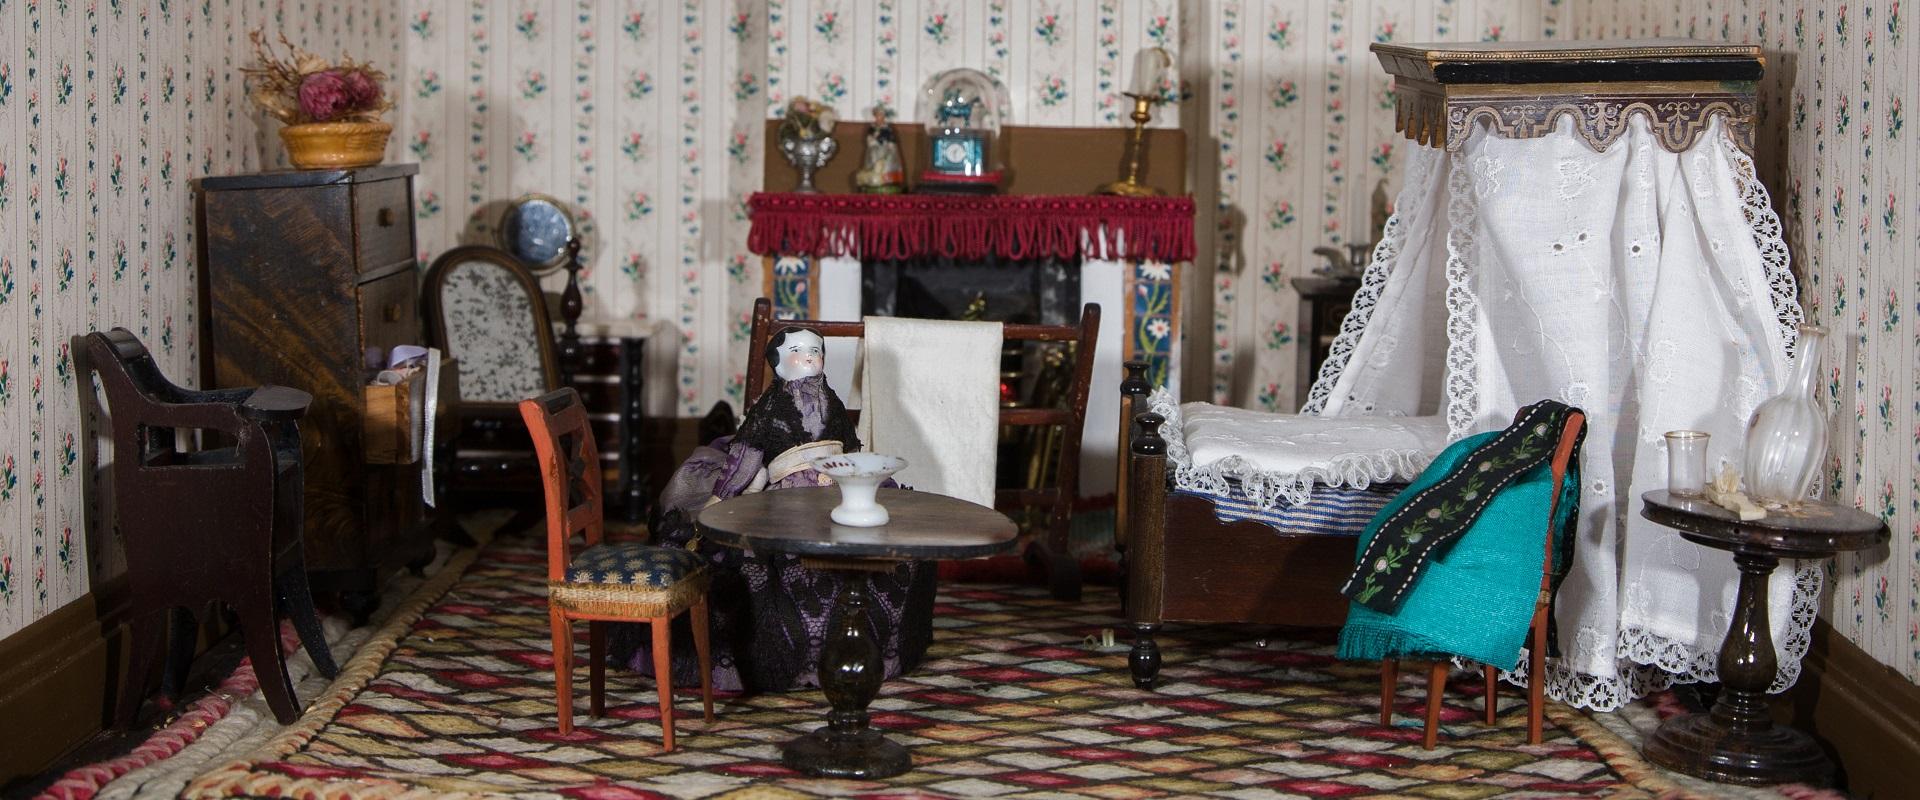 Dolls House Bedroom interior